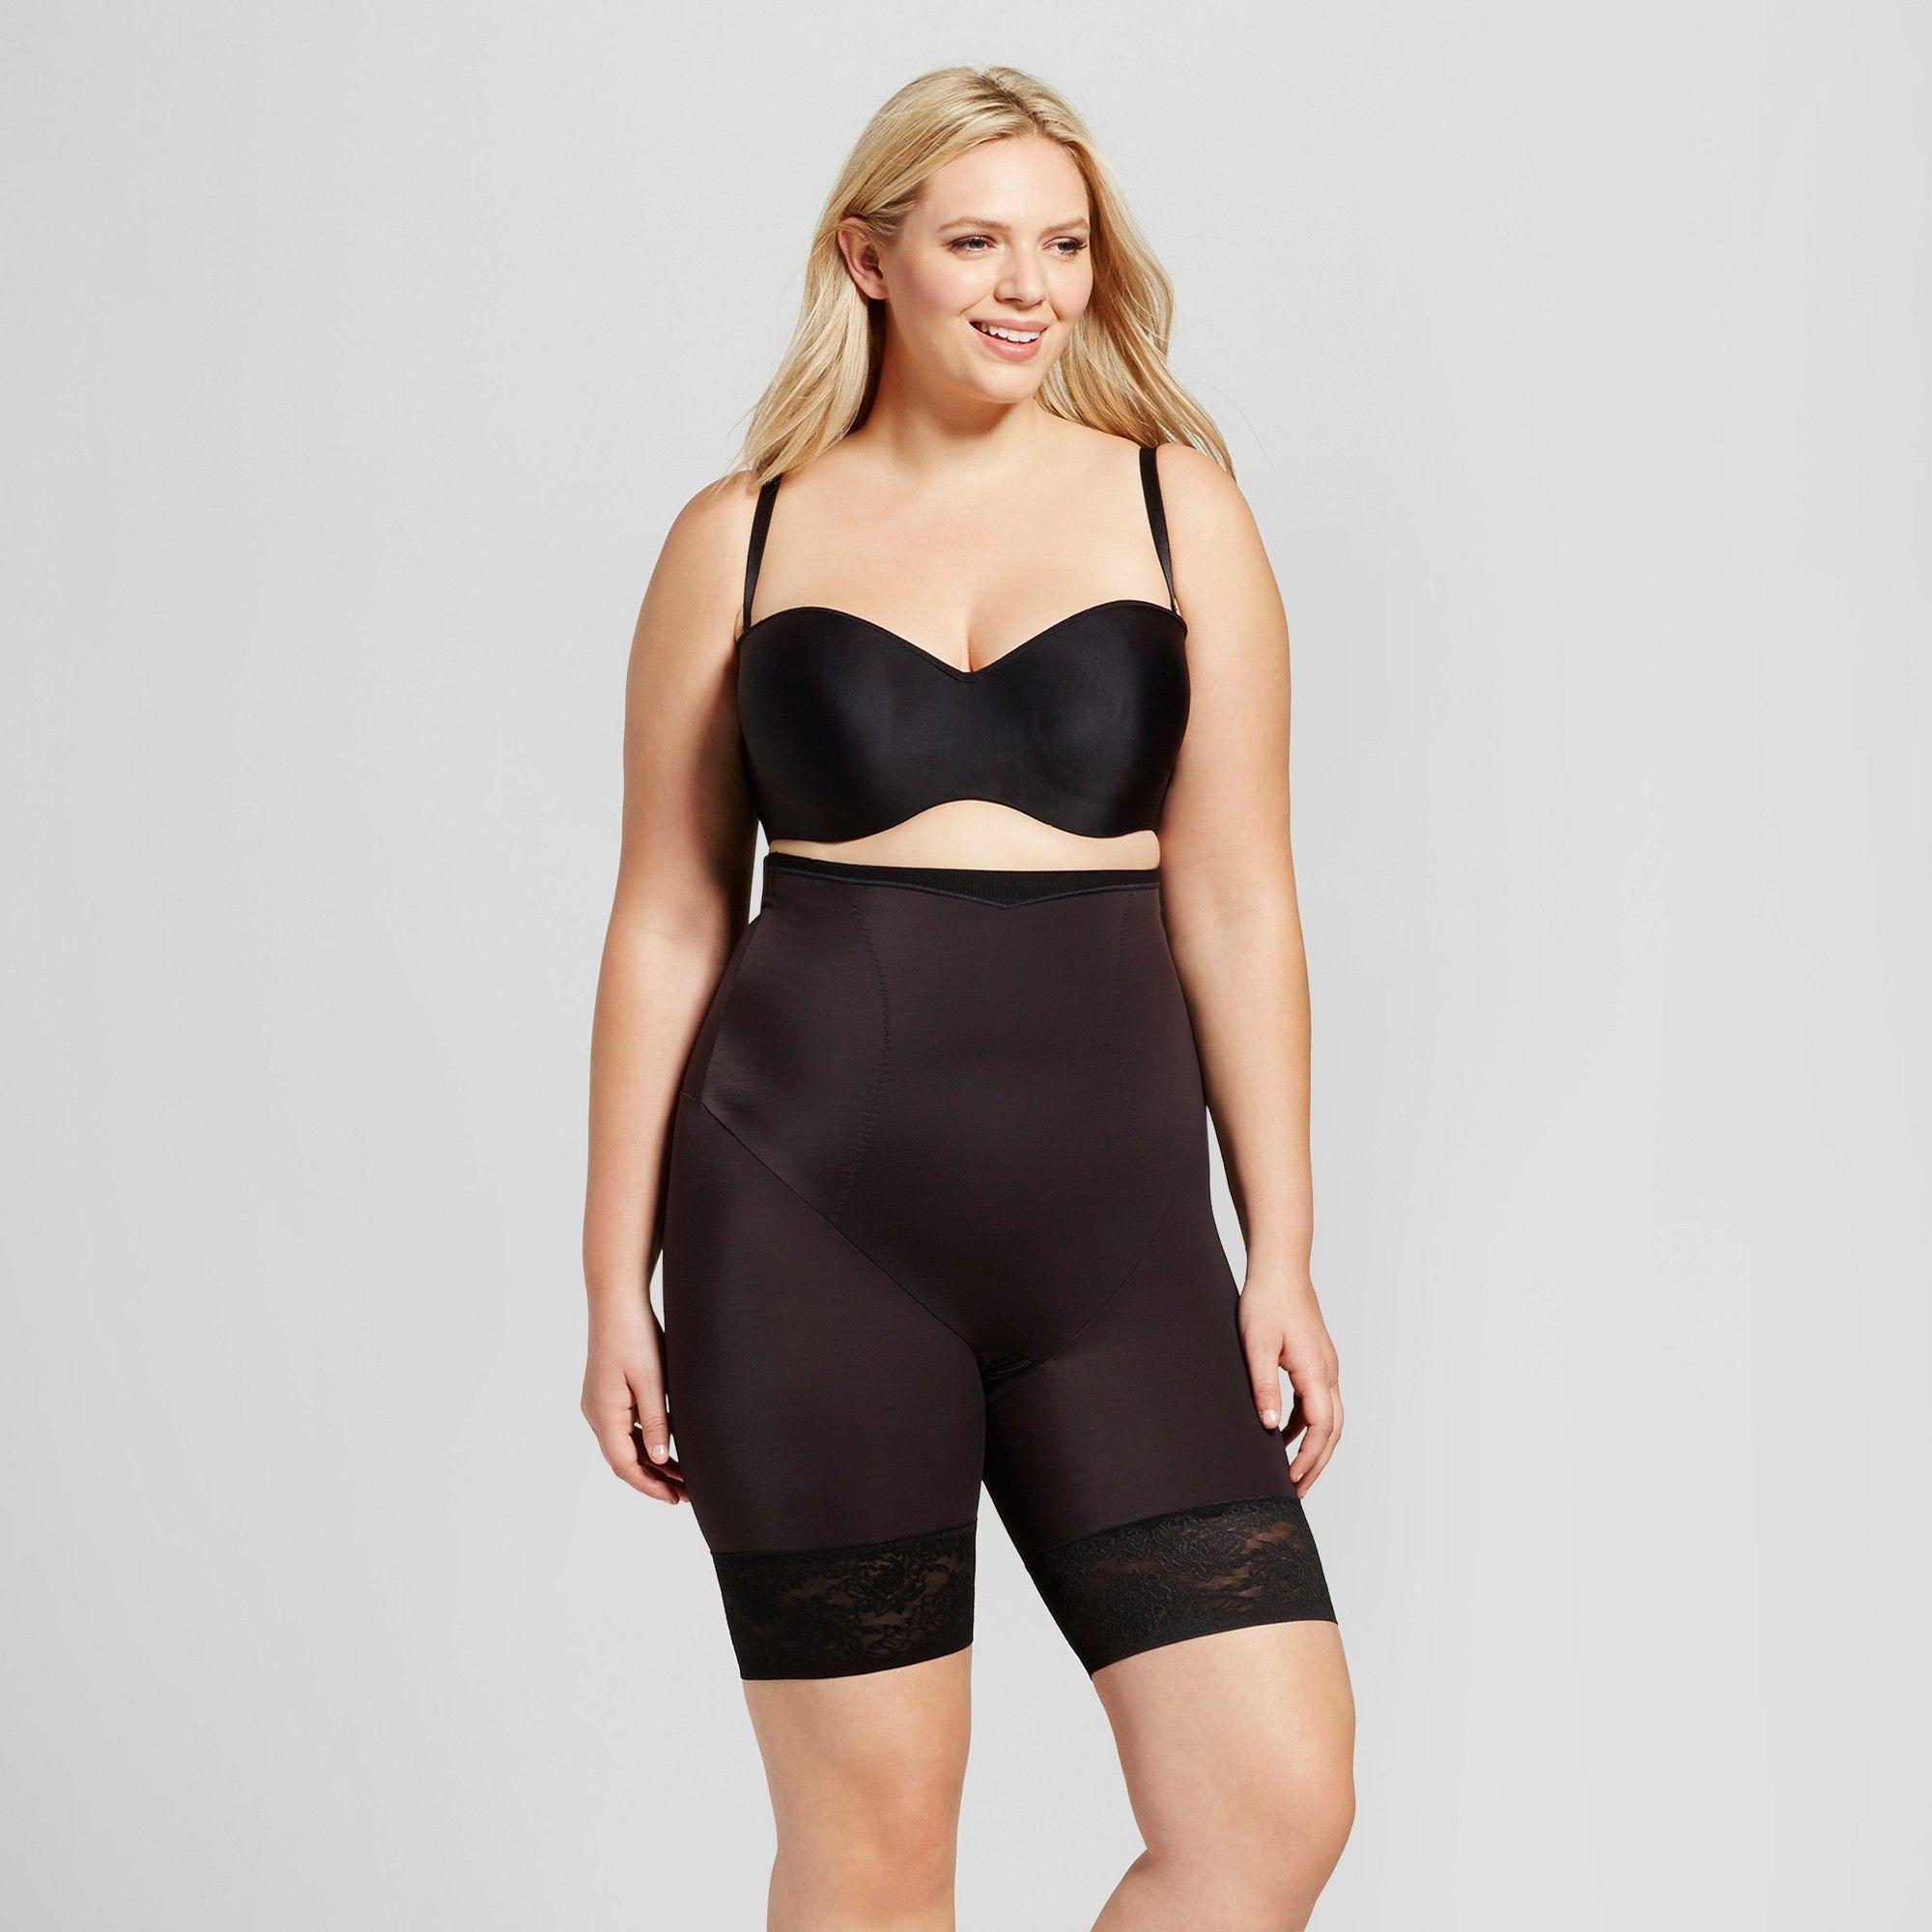 83630ff7e4 Plus Size Maidenform Self Expressions Women s Plus High Waist Thigh Slimmer  - SE1024